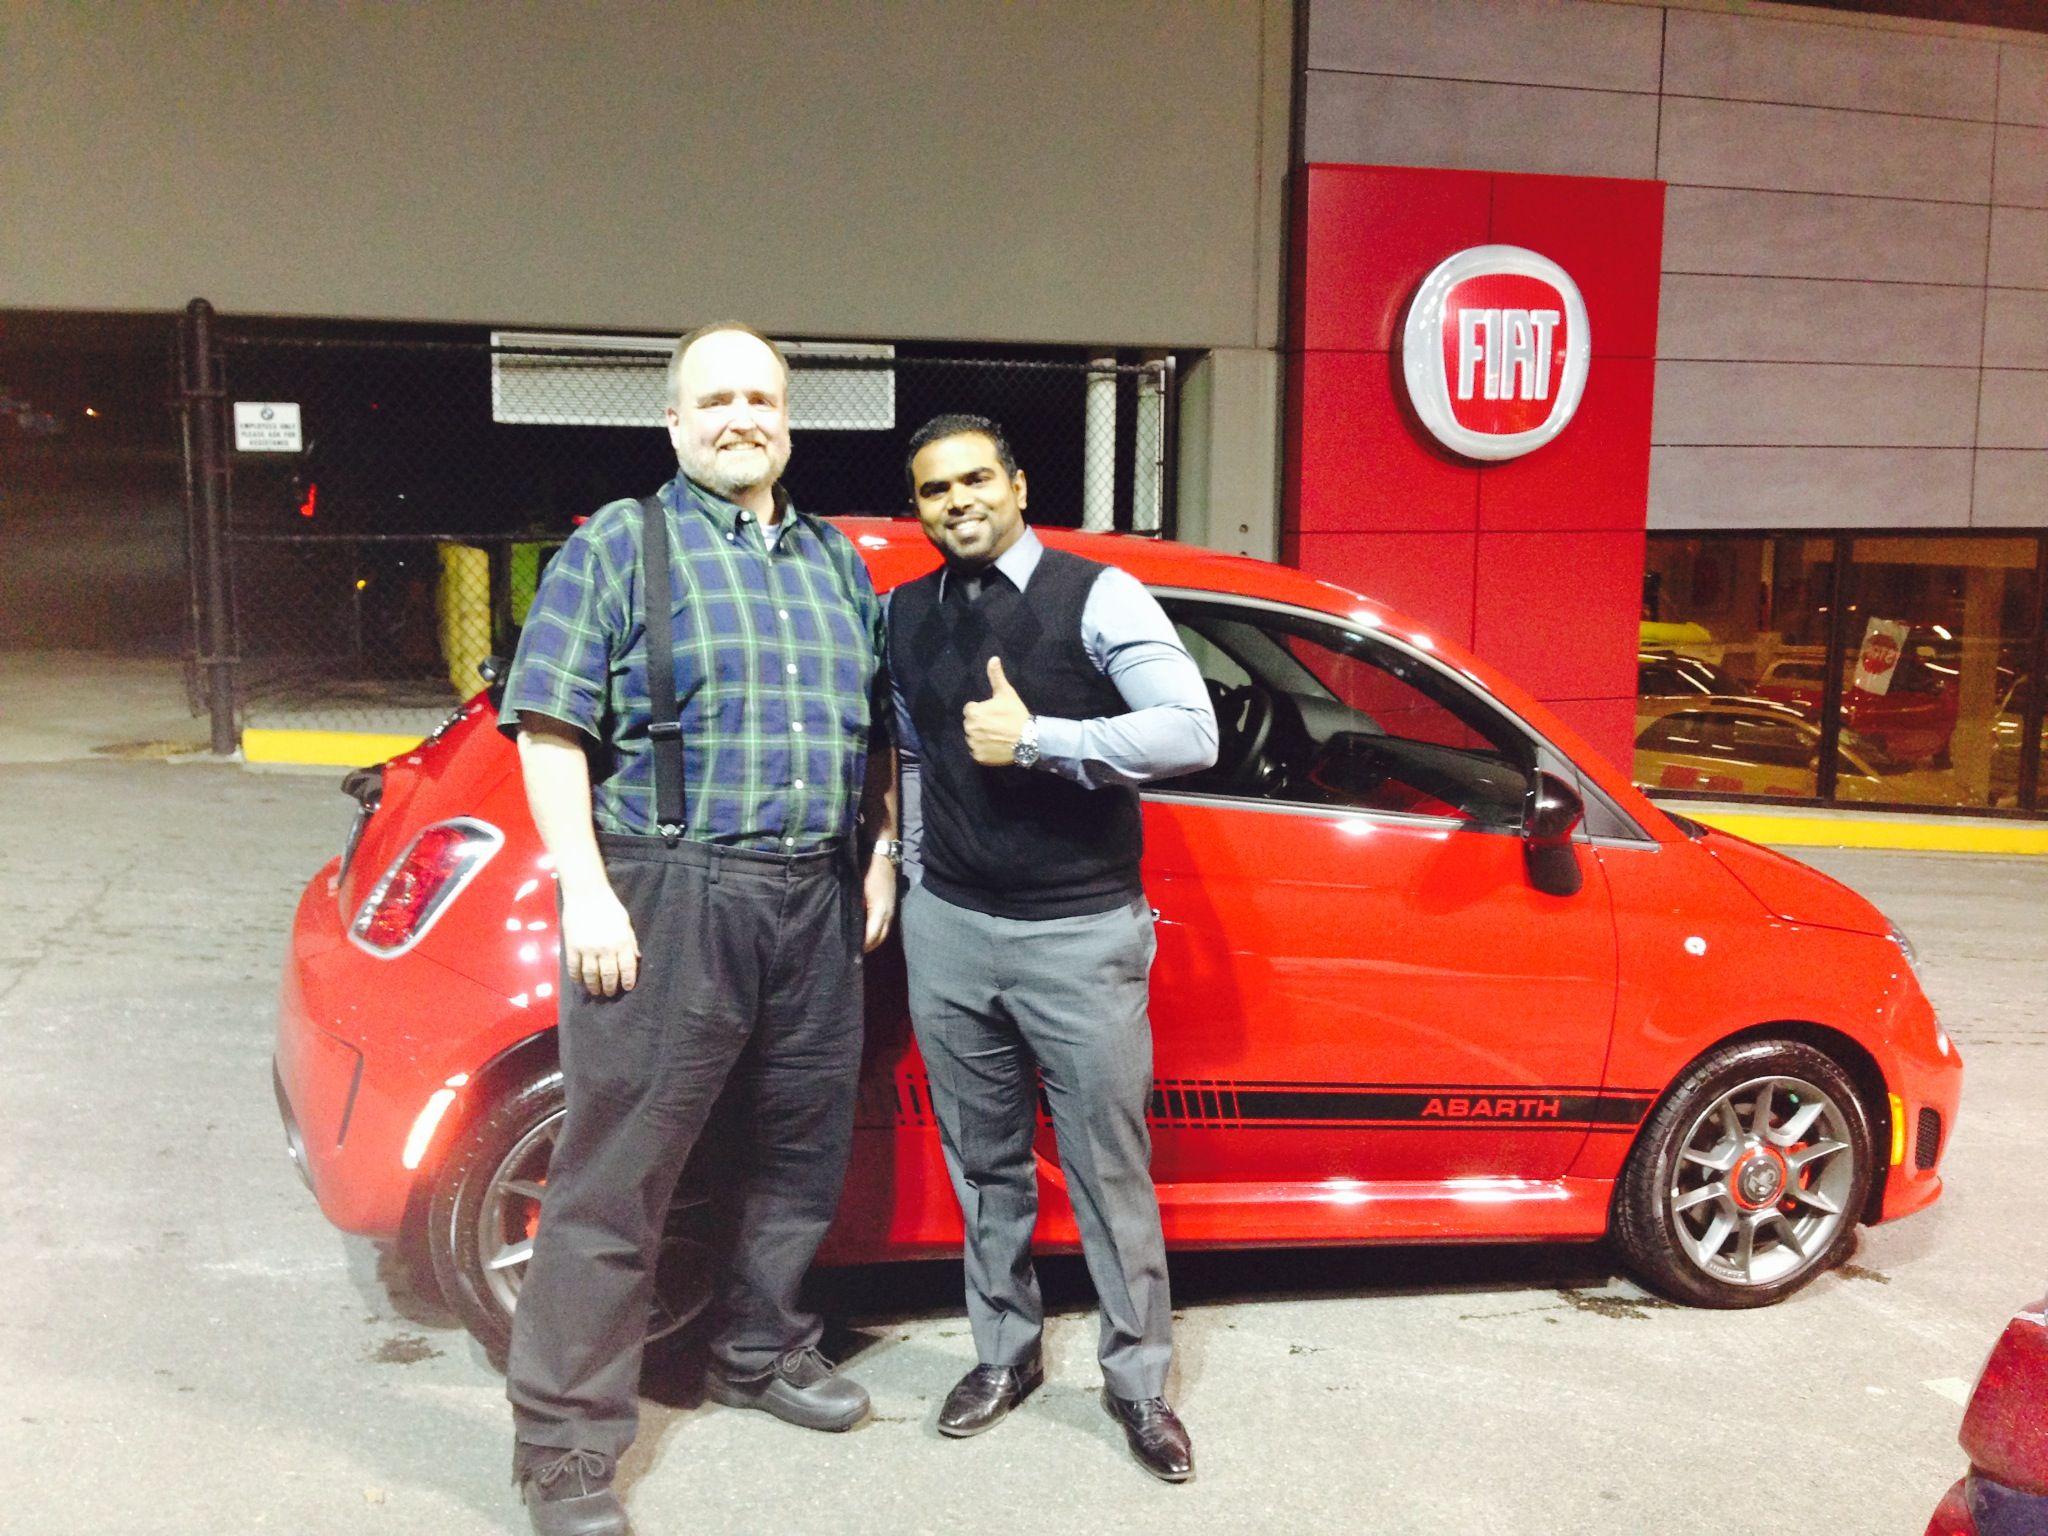 Happy my car Monday the this gentleman and his new Fiat Abarth, buona fortuna! #mycarmonday #mncm #Fiat #Abarth #cinquecento #RosenthalAuto